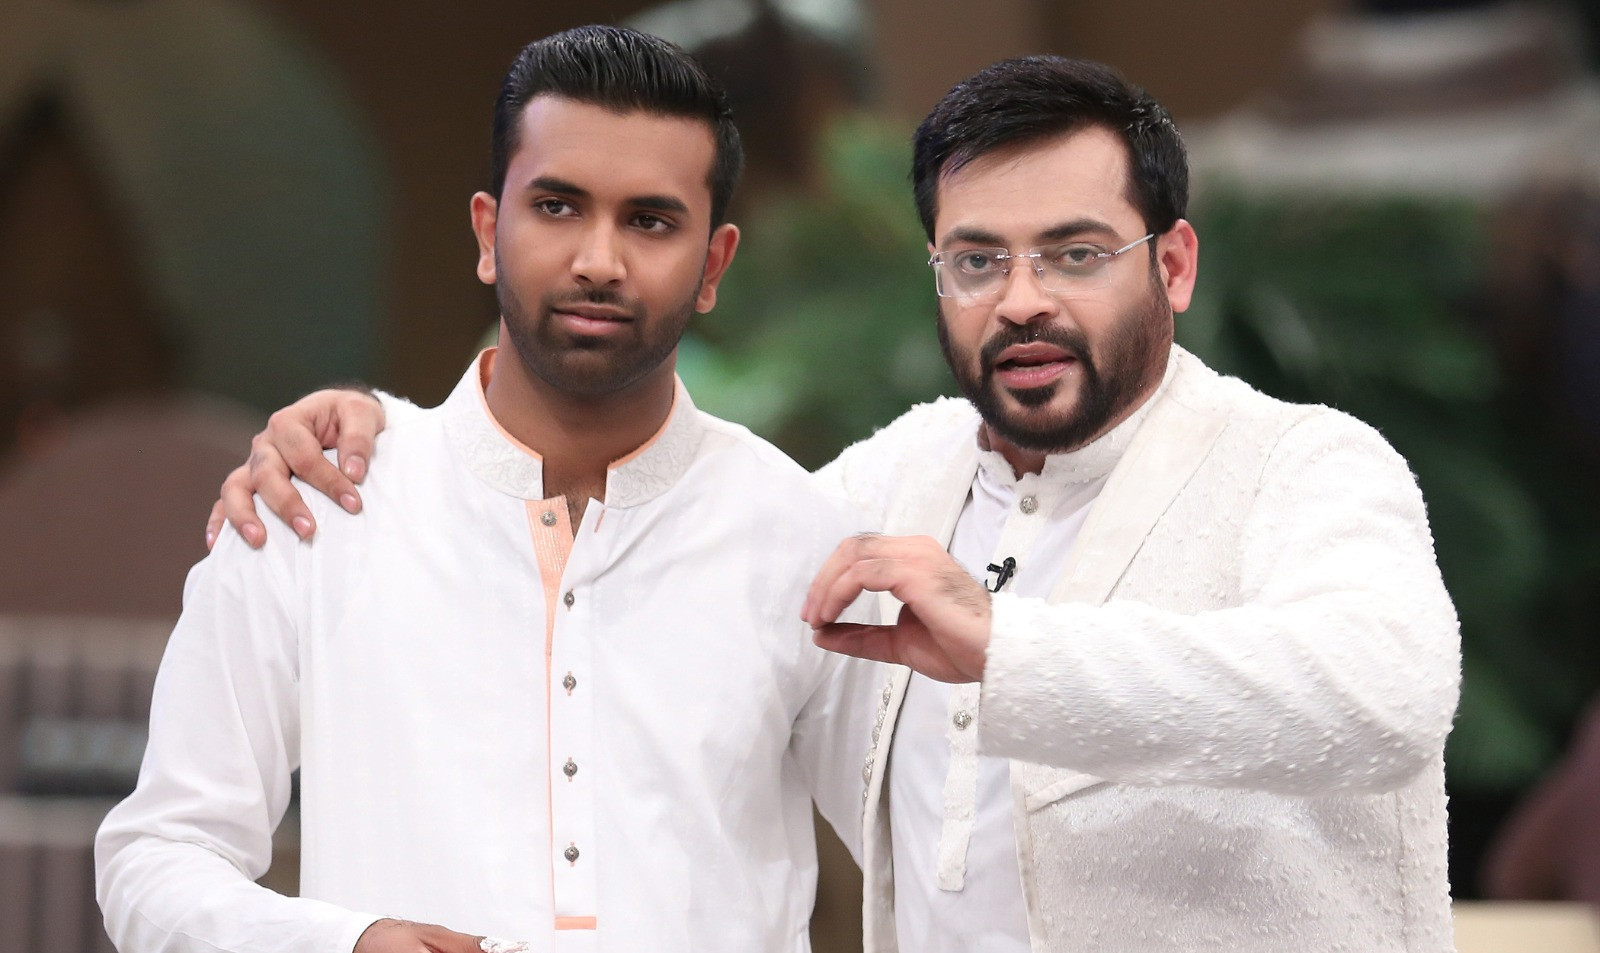 with Dr. Aamir Liaquat Husain